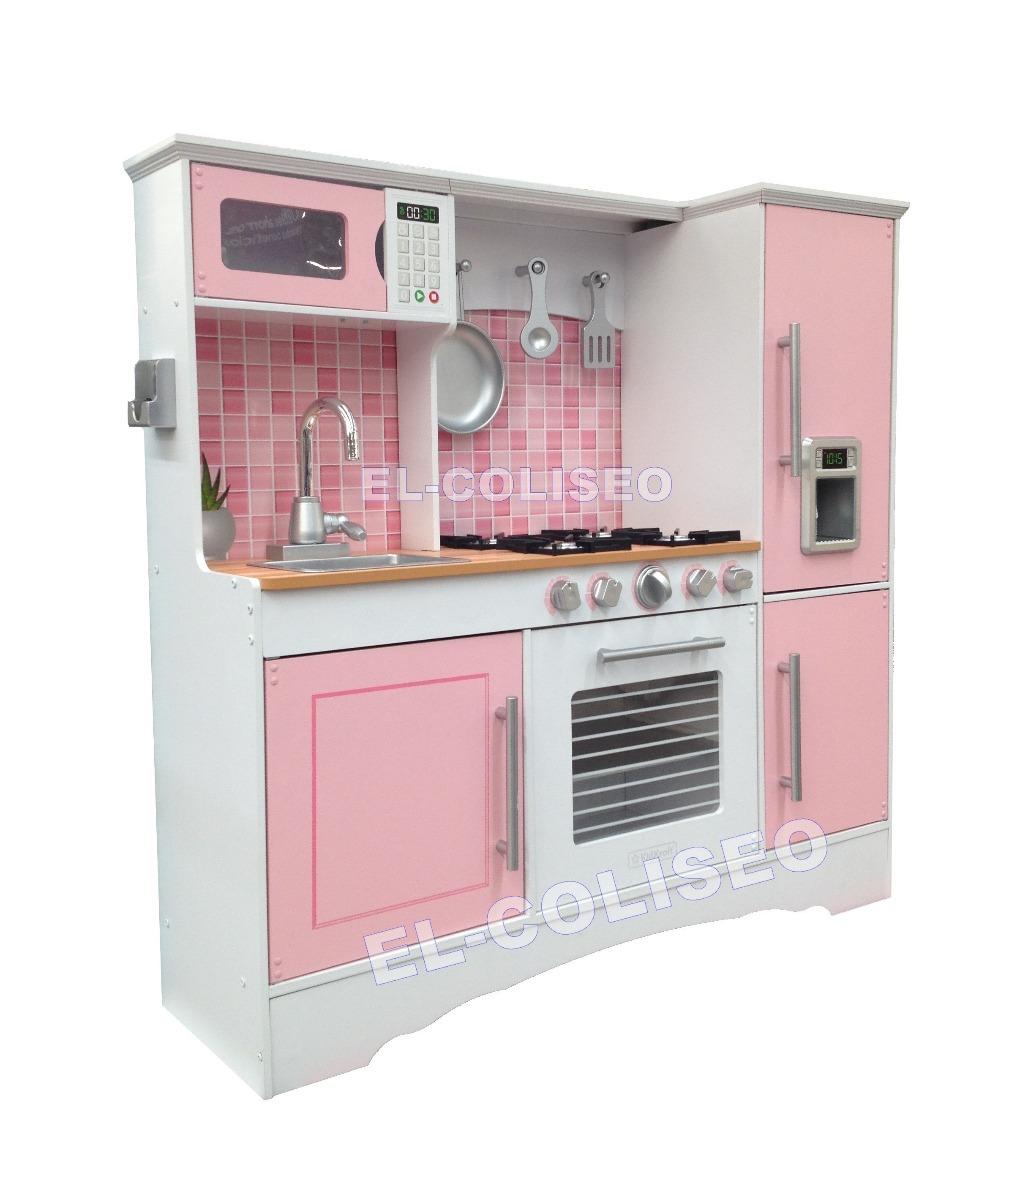 Juguete Para Casa Accesorios Kidkraft Color Rosa Nia